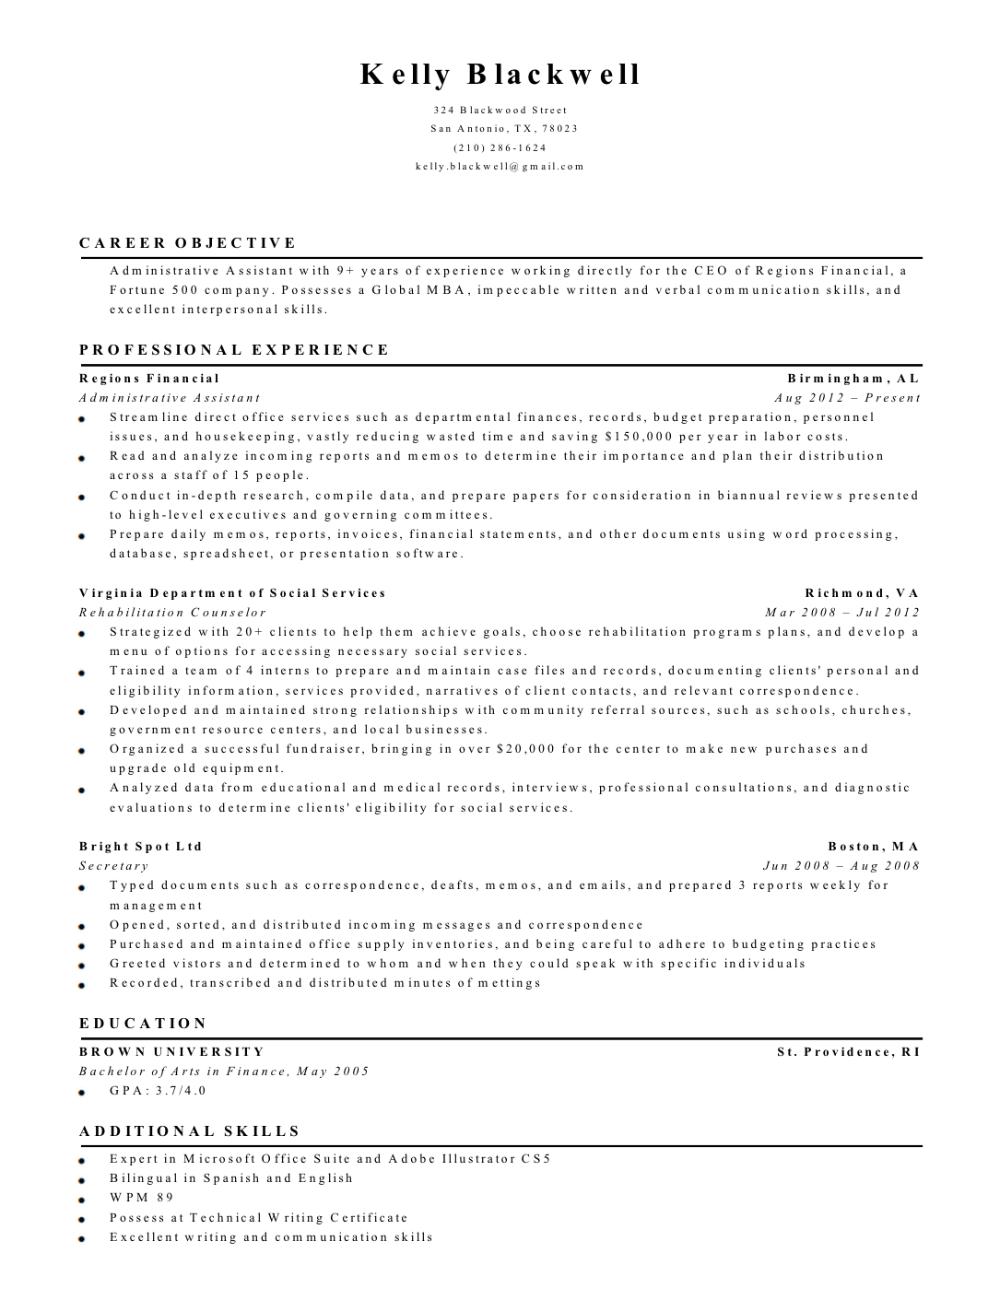 Resume Builder Resume builder, Resume, Functional resume